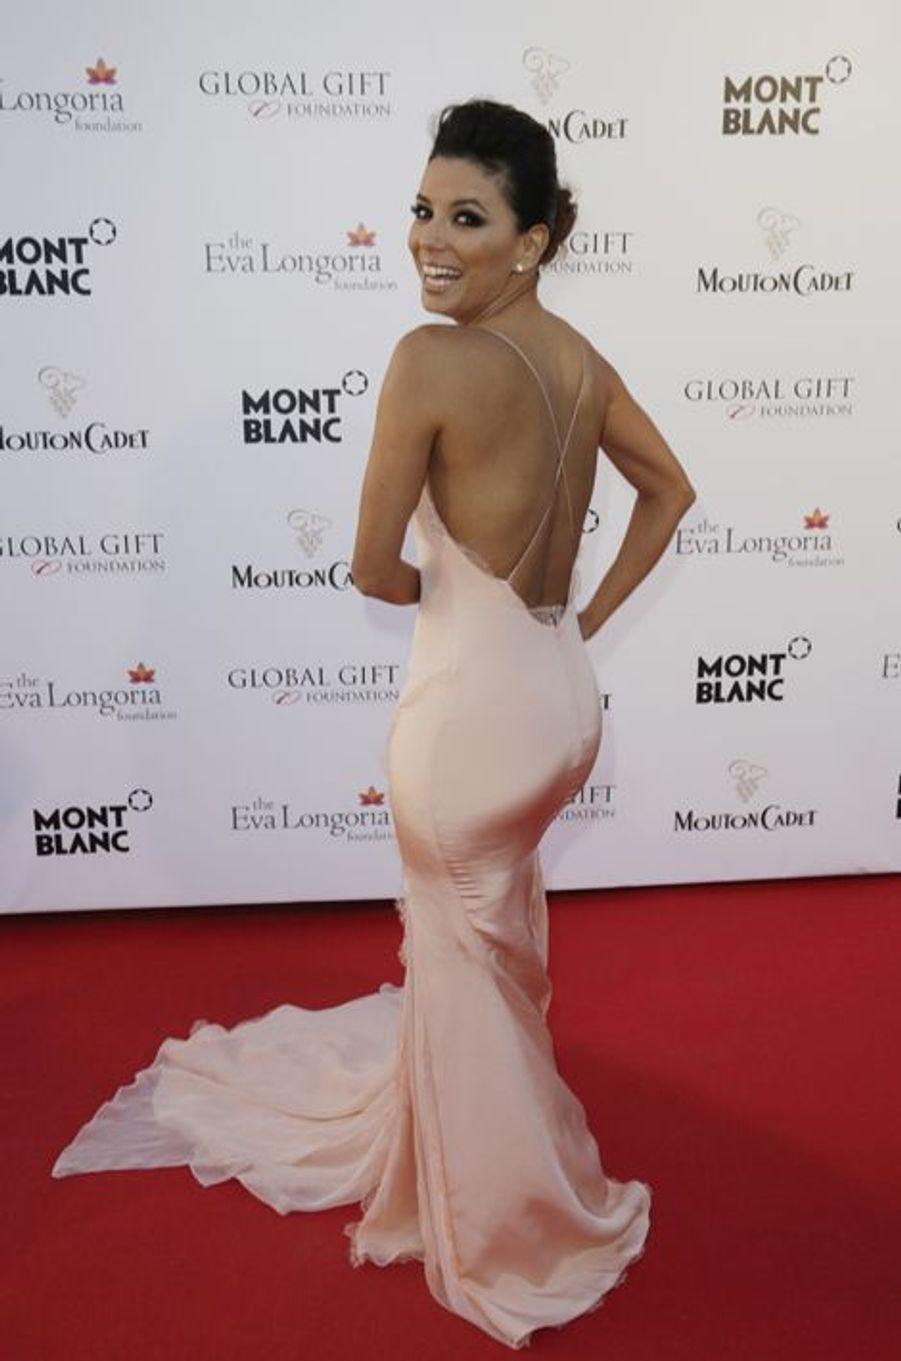 Au Global Gift Gala, Eva Longoria